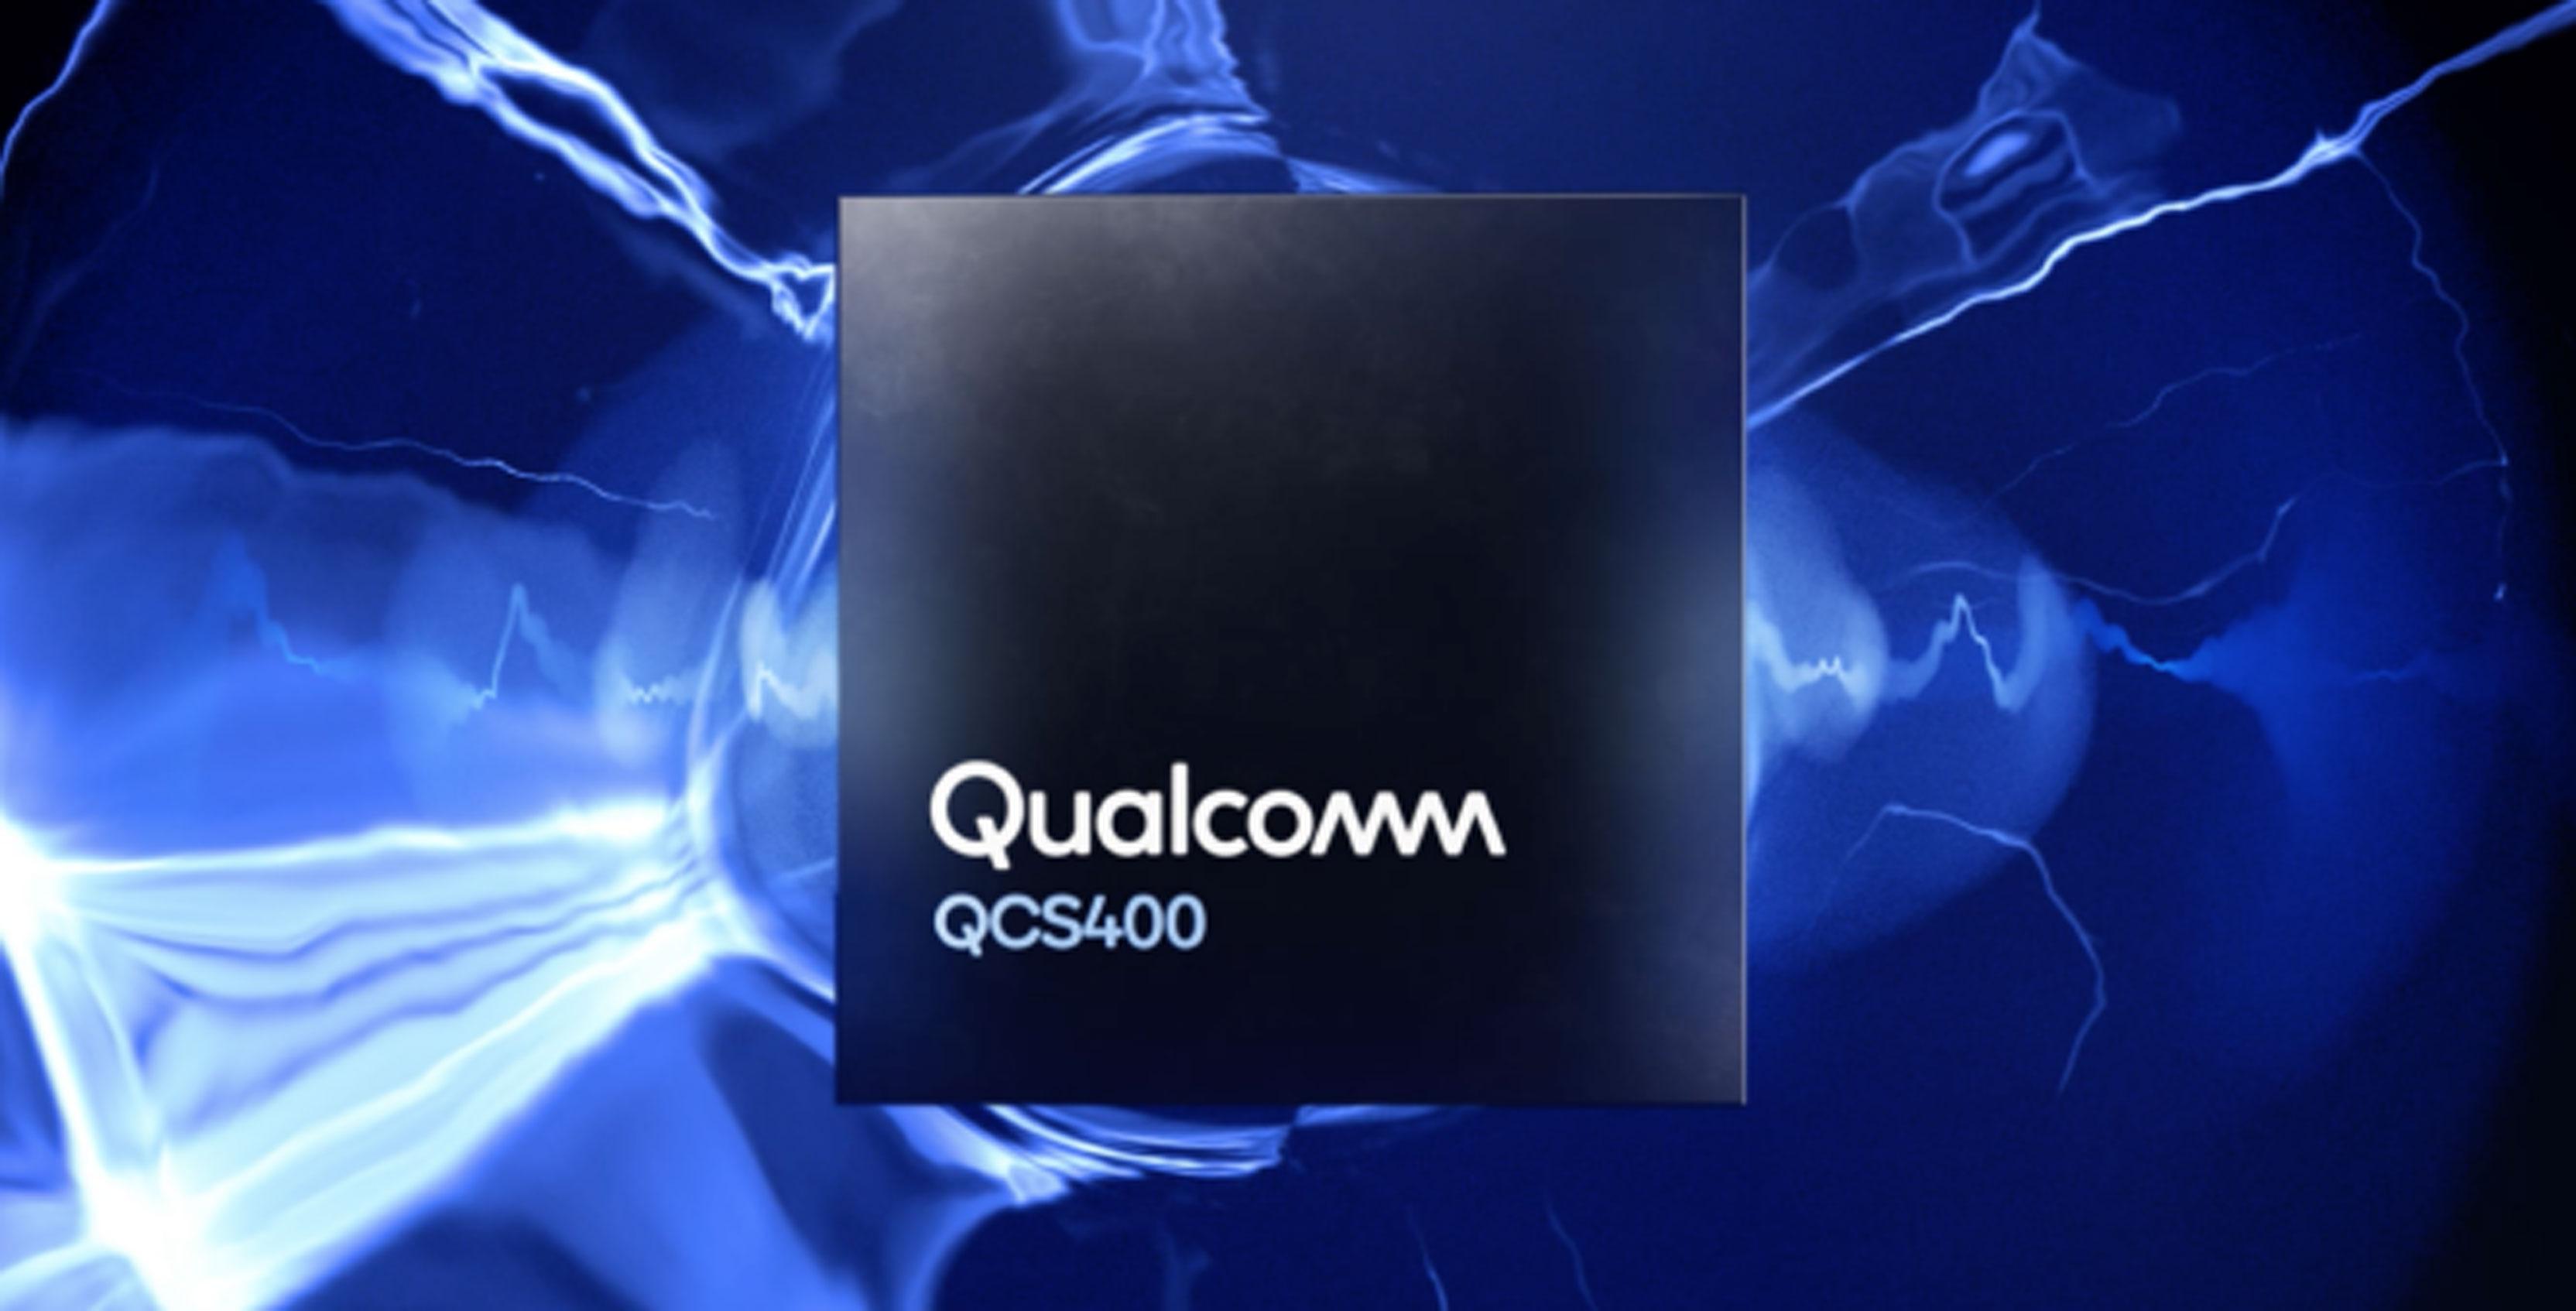 Qualcomm's new QCS400 chipset